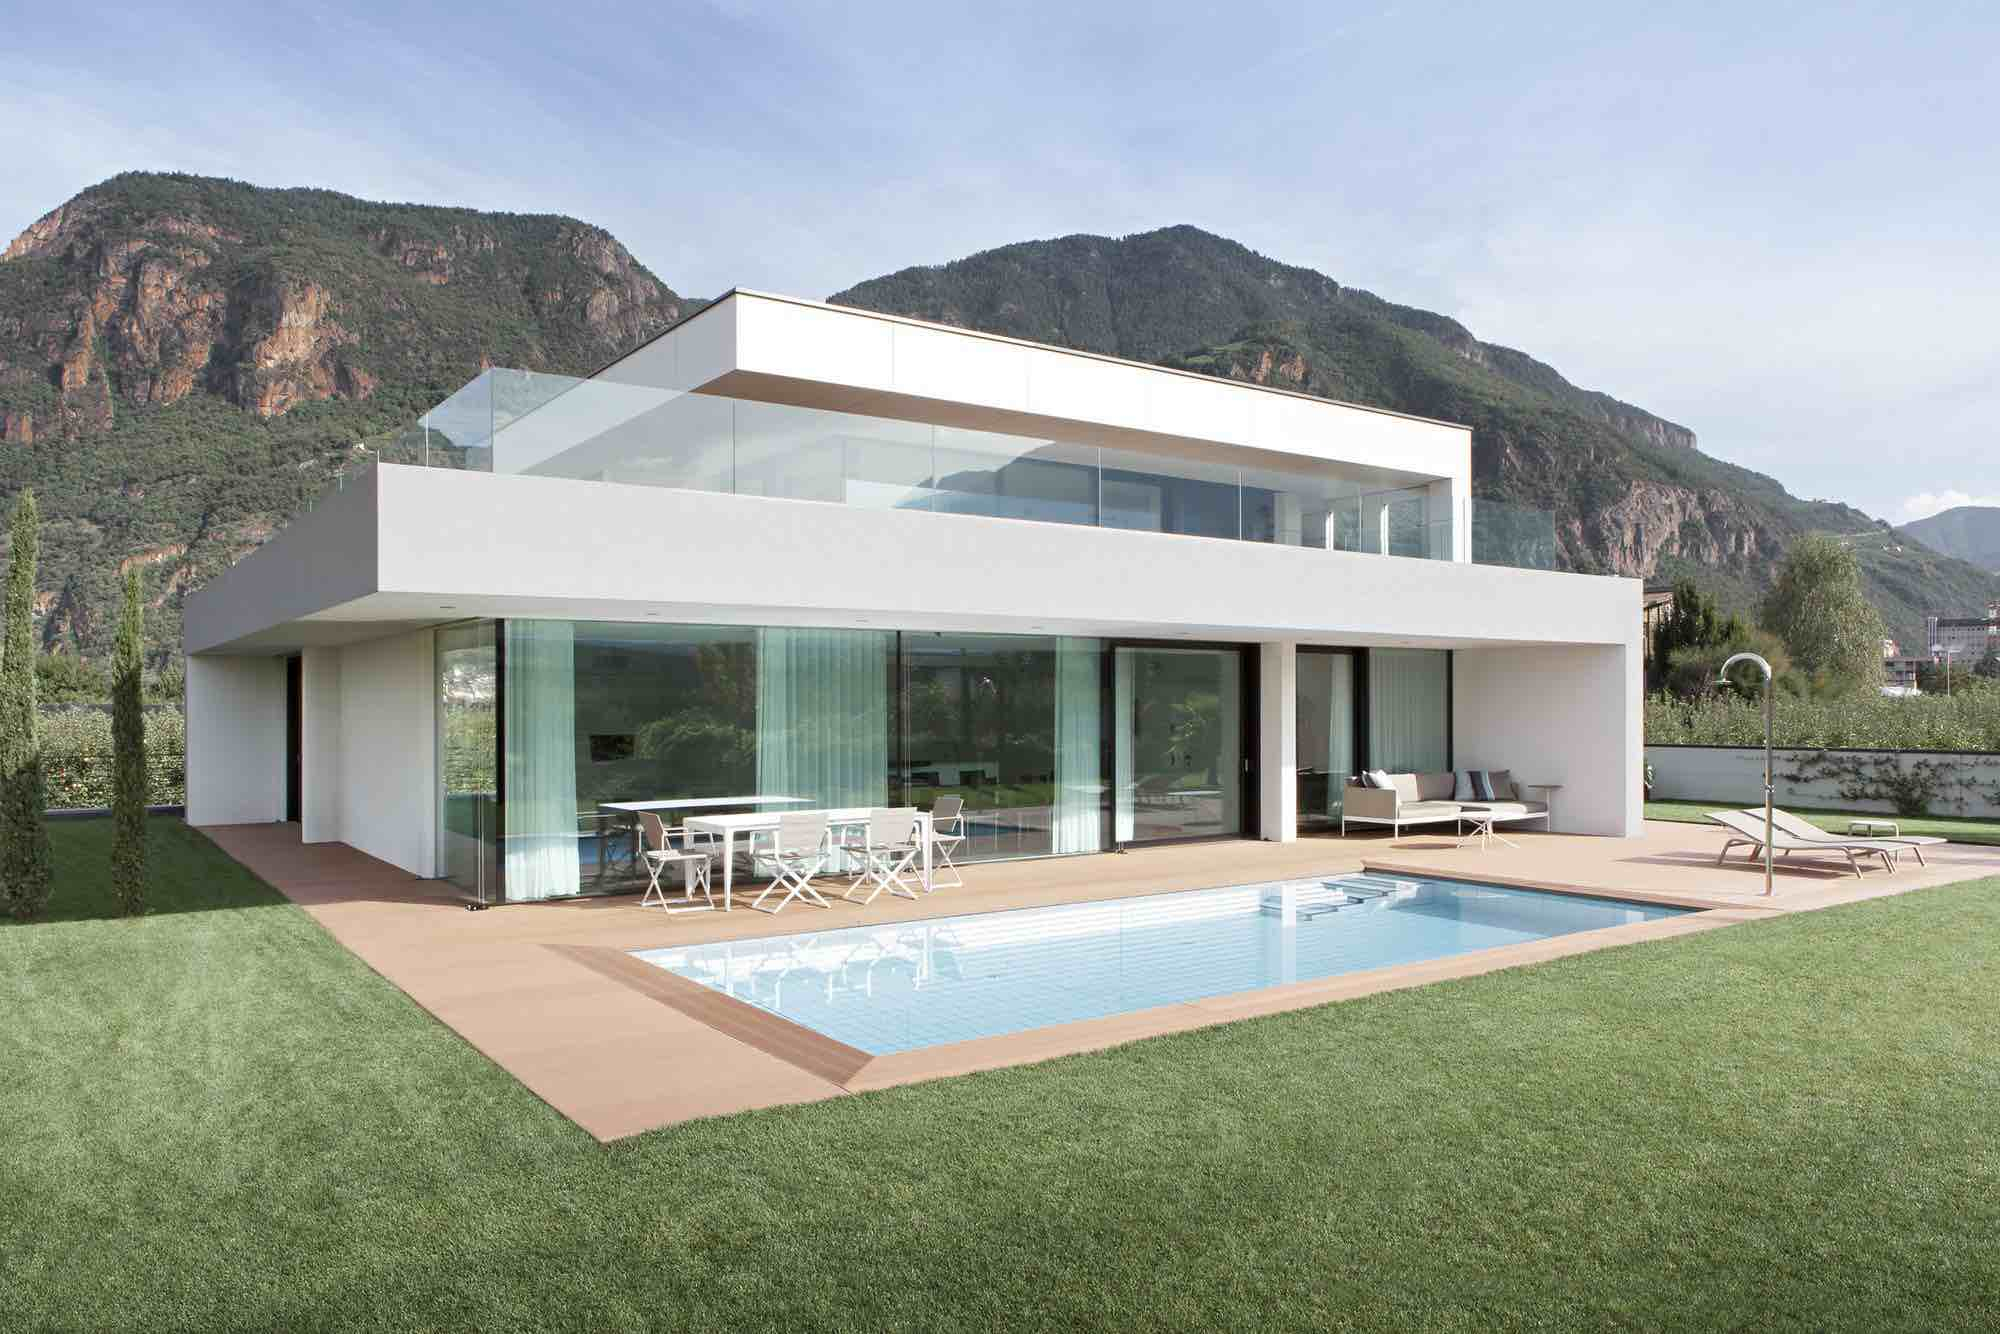 m2-house-monovolume-architecture-design_villa_moritzing_01